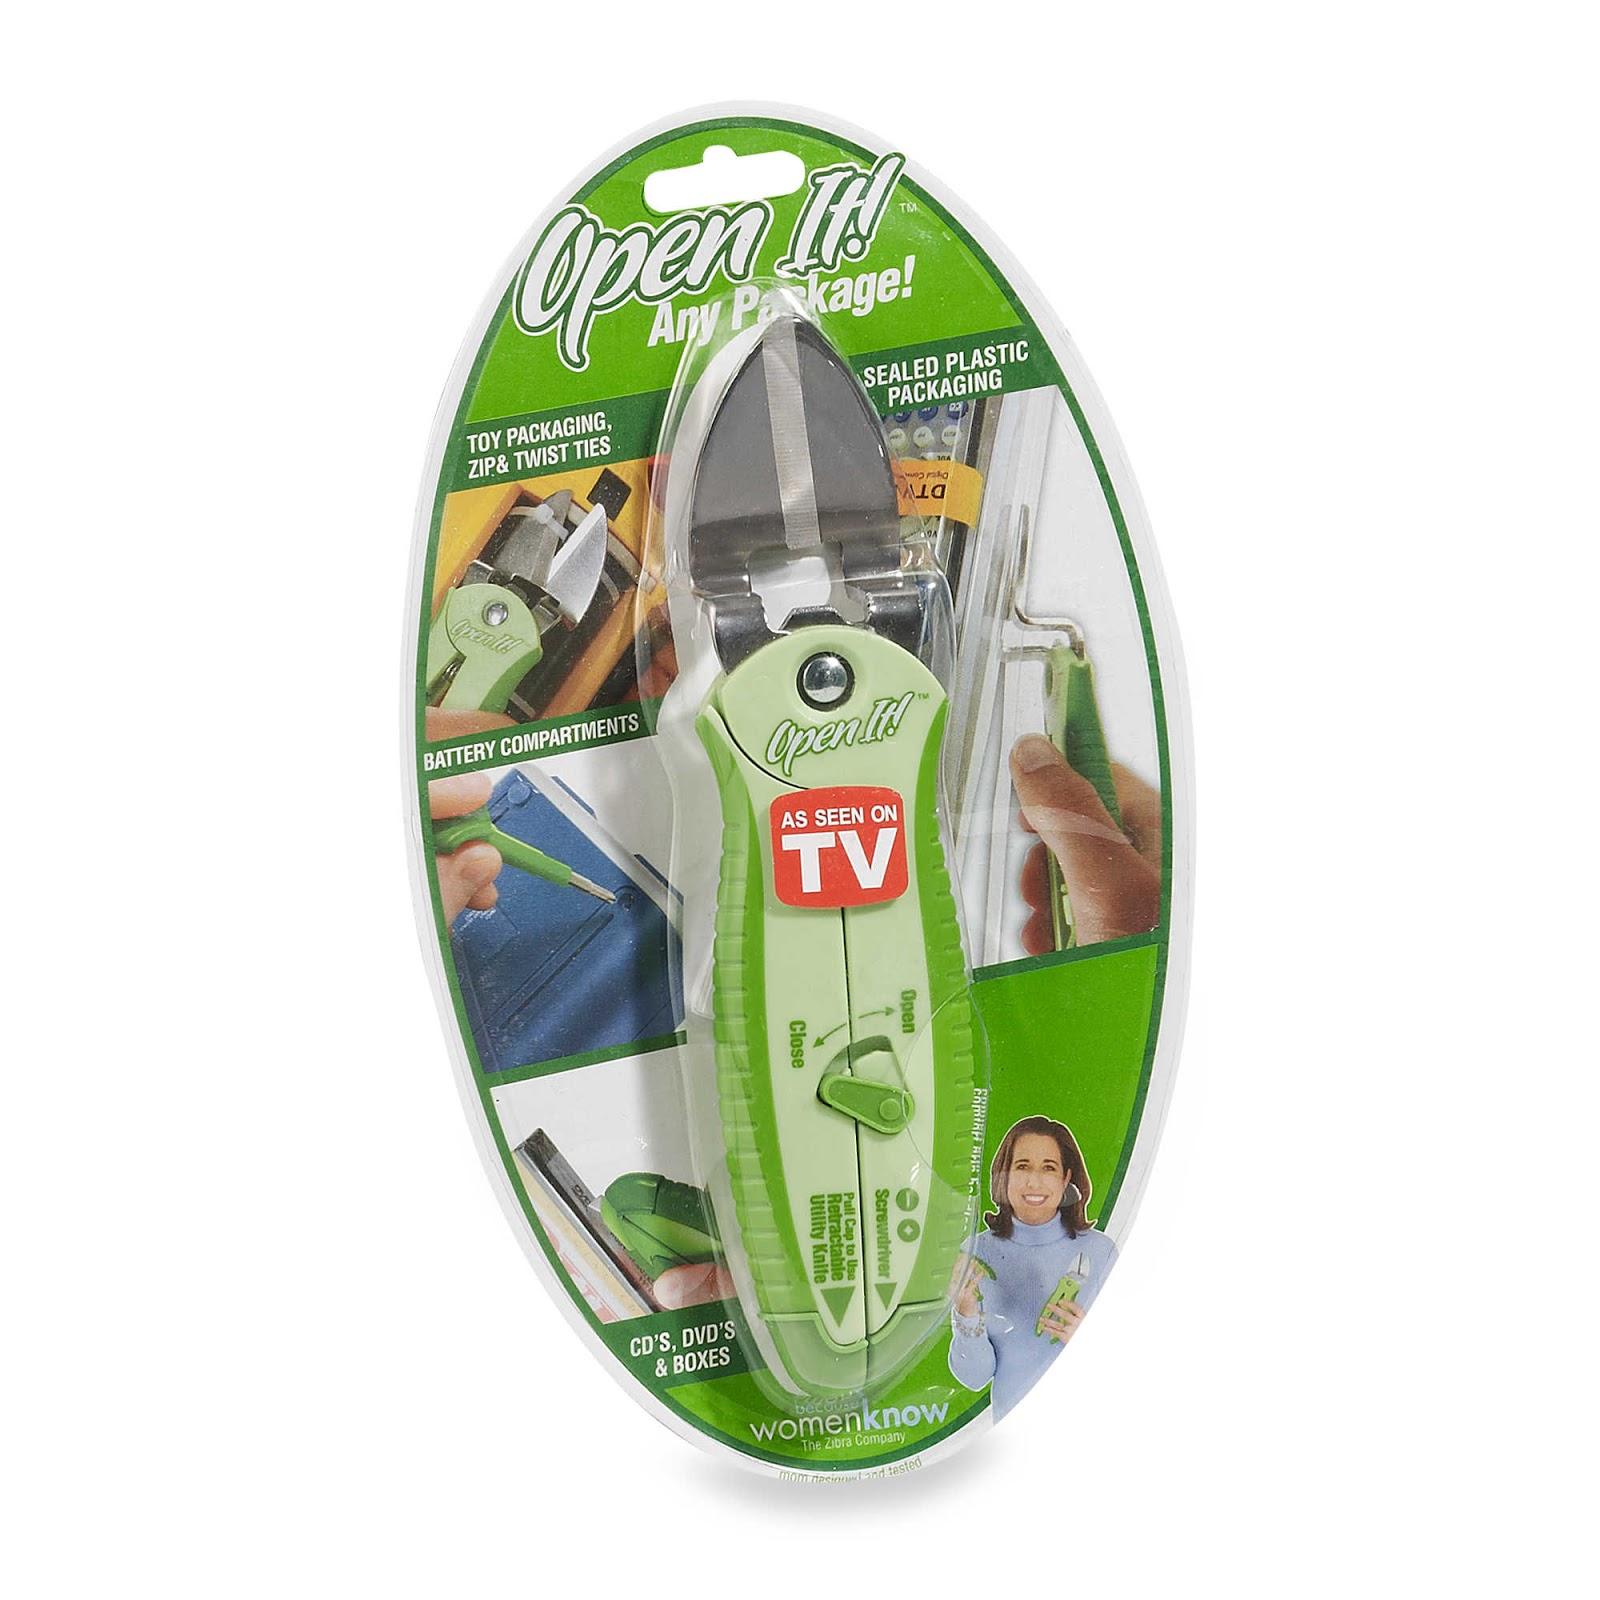 Open It scissors for plastic packaging